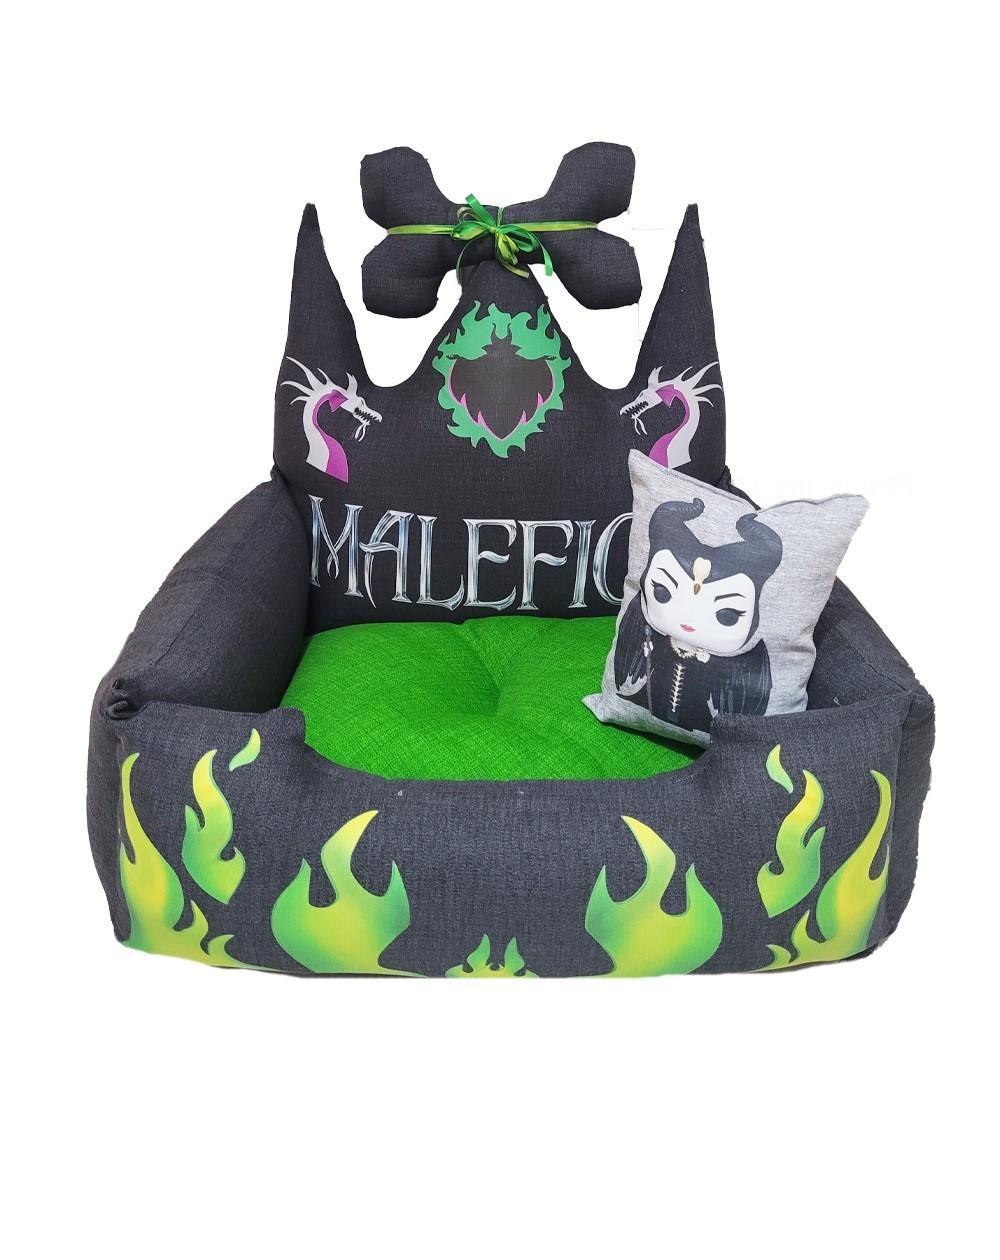 Cuccia Disney Maleficent